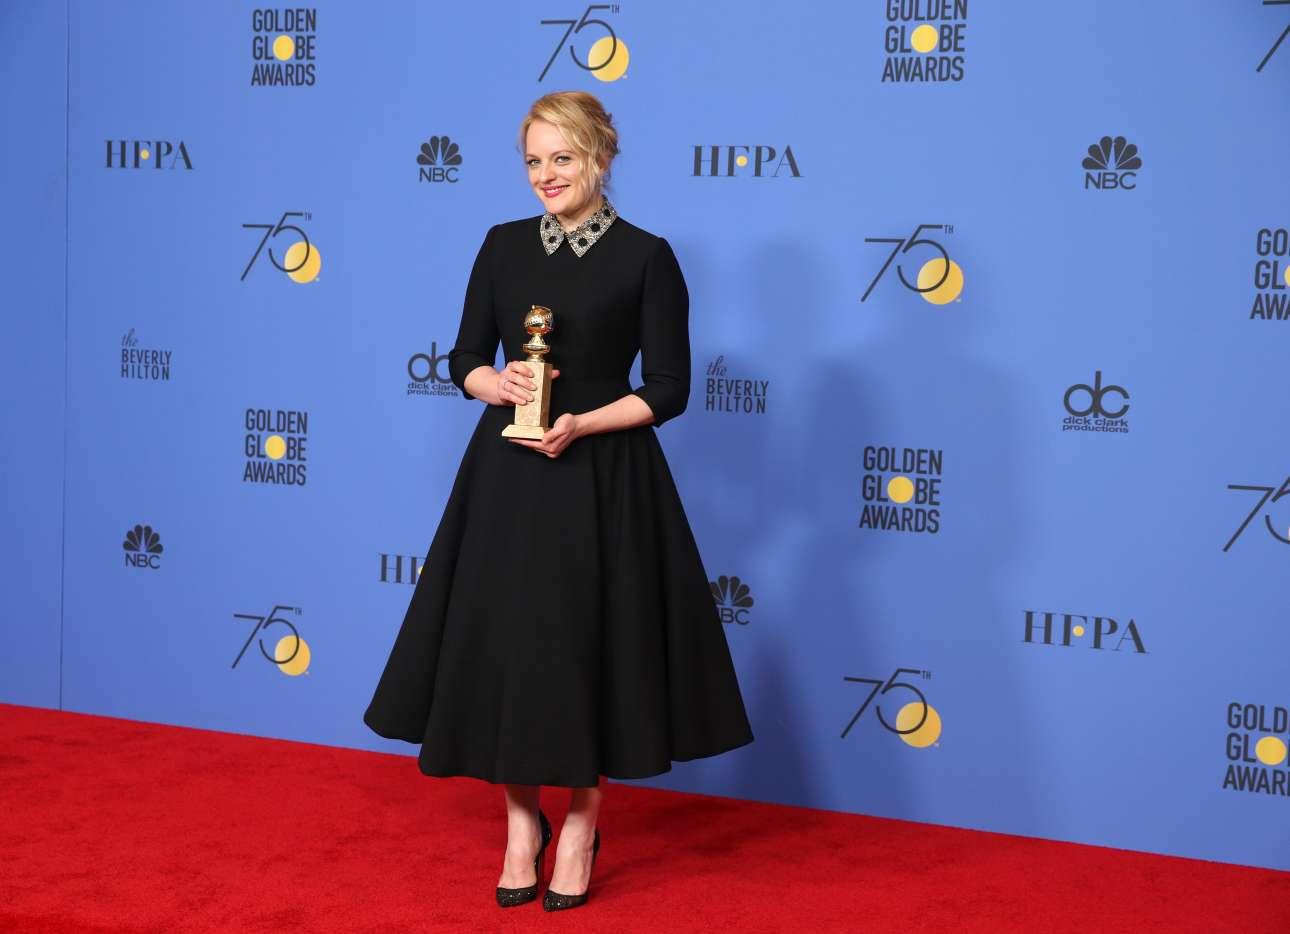 H Ελίζαμπεθ Μος με το βραβείο καλύτερης γυναικείας ερμηνείας σε τηλεοπτική σειρά για το «Τhe Handmaid's Tale»